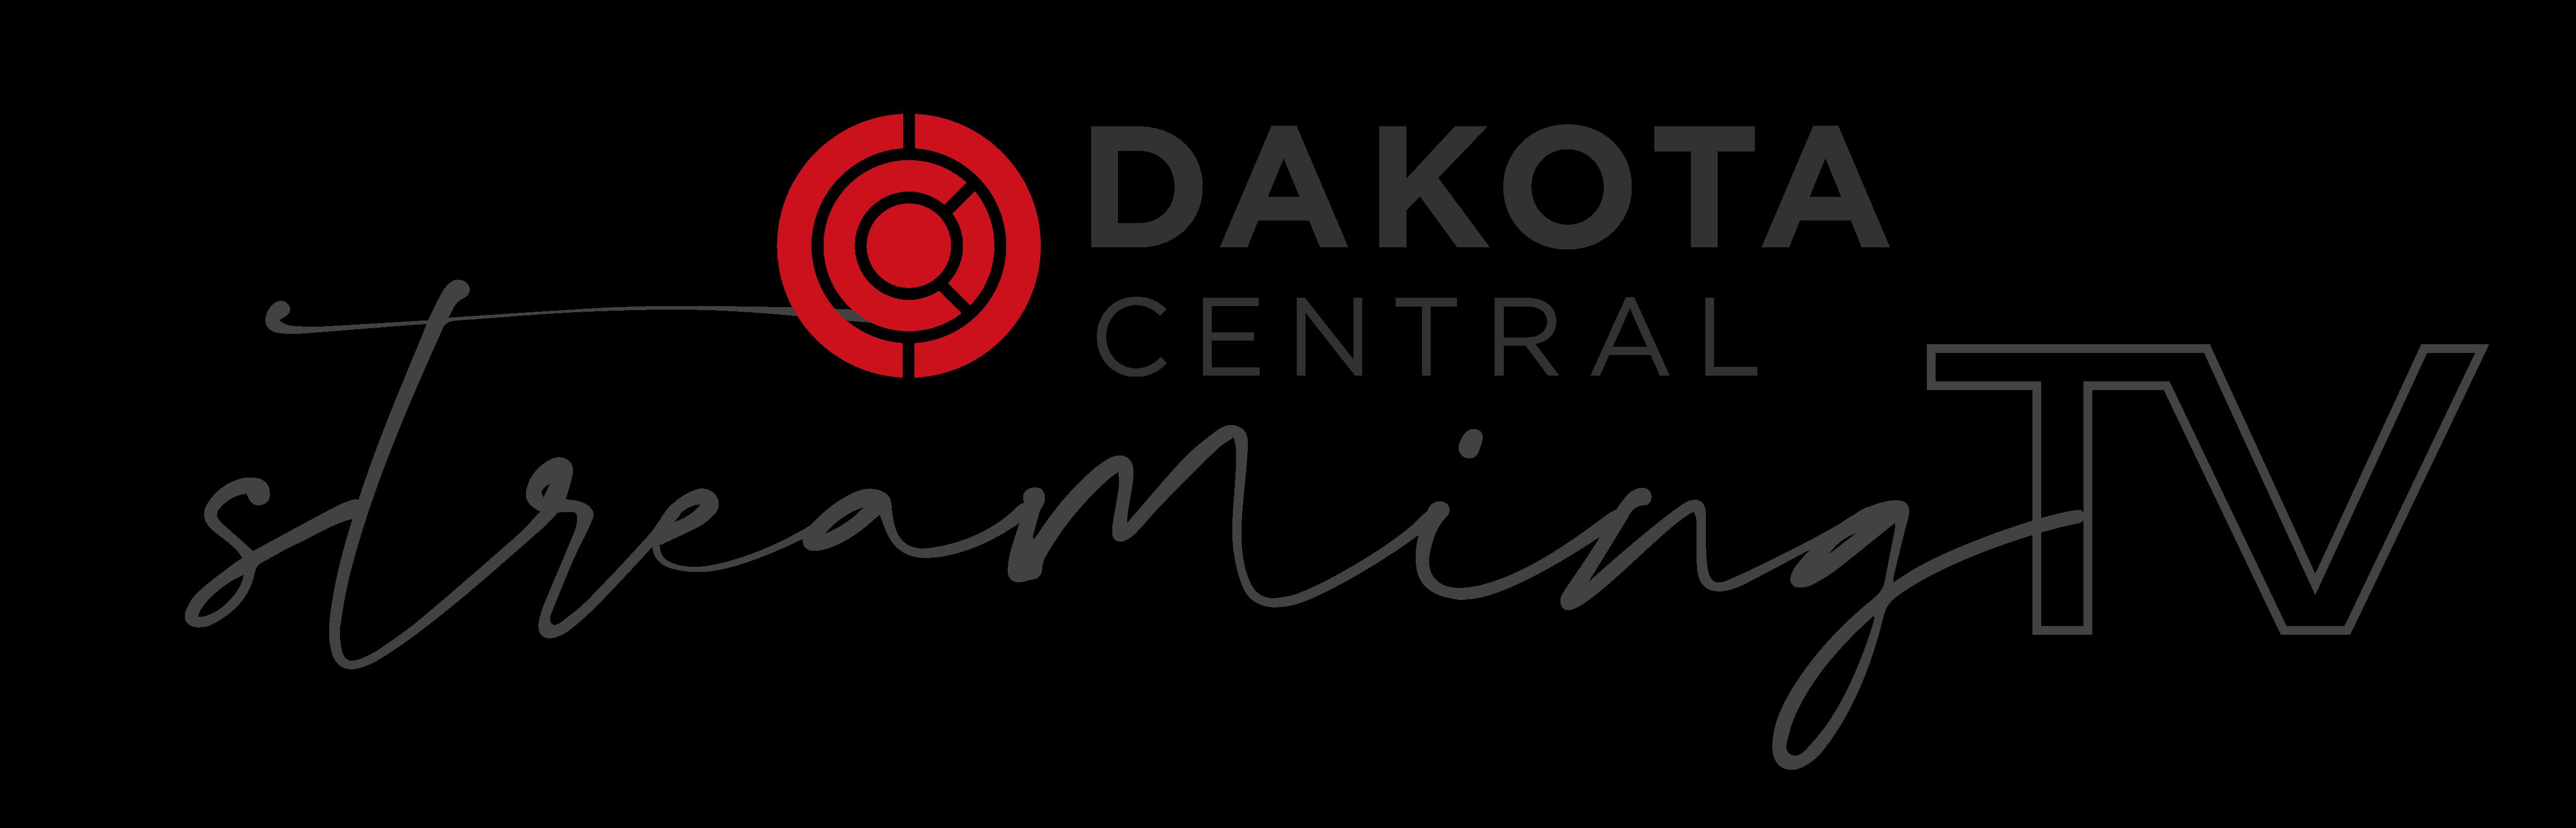 Dakota Central Streaming TV Logo